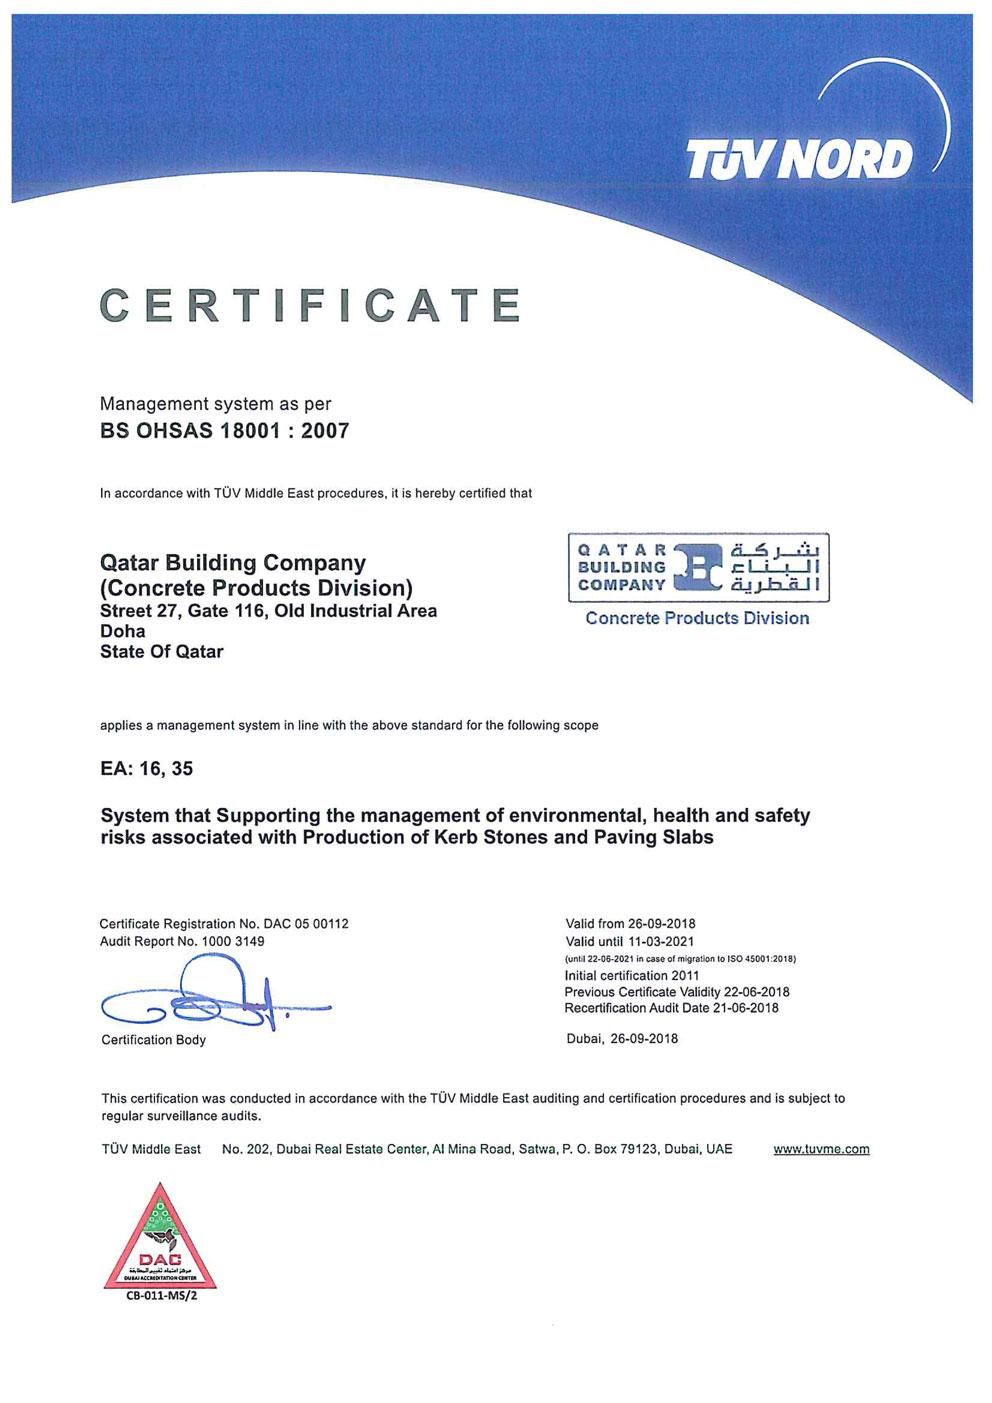 Qatar-Building-Company-BS-OHSAS-18001-2007